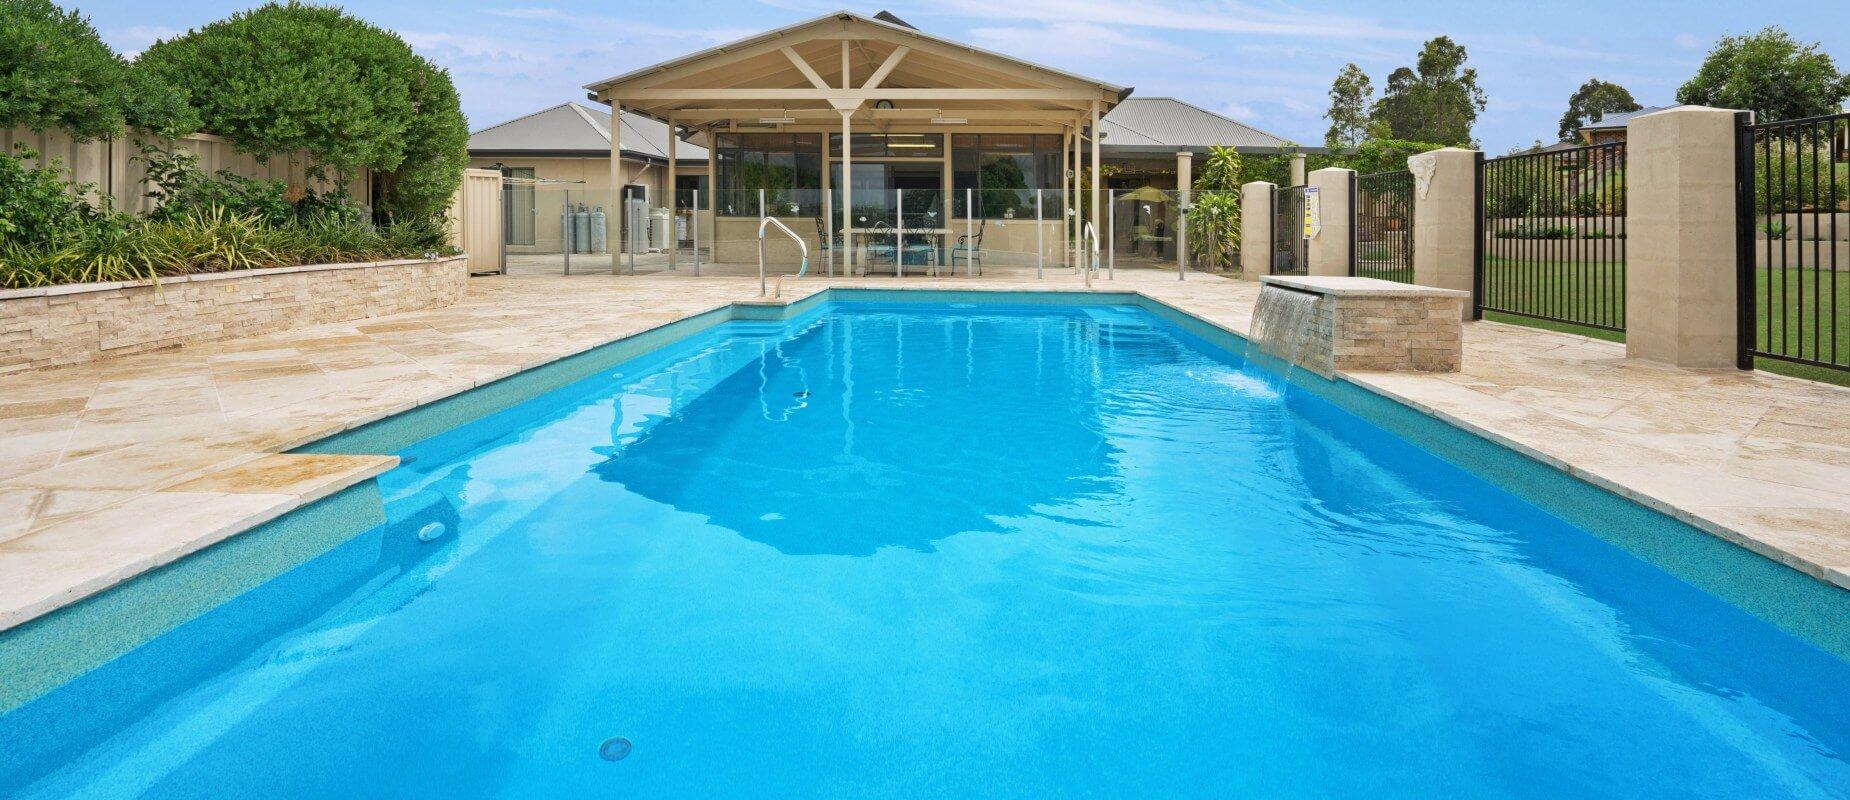 piscina de lux modele frumoase 24